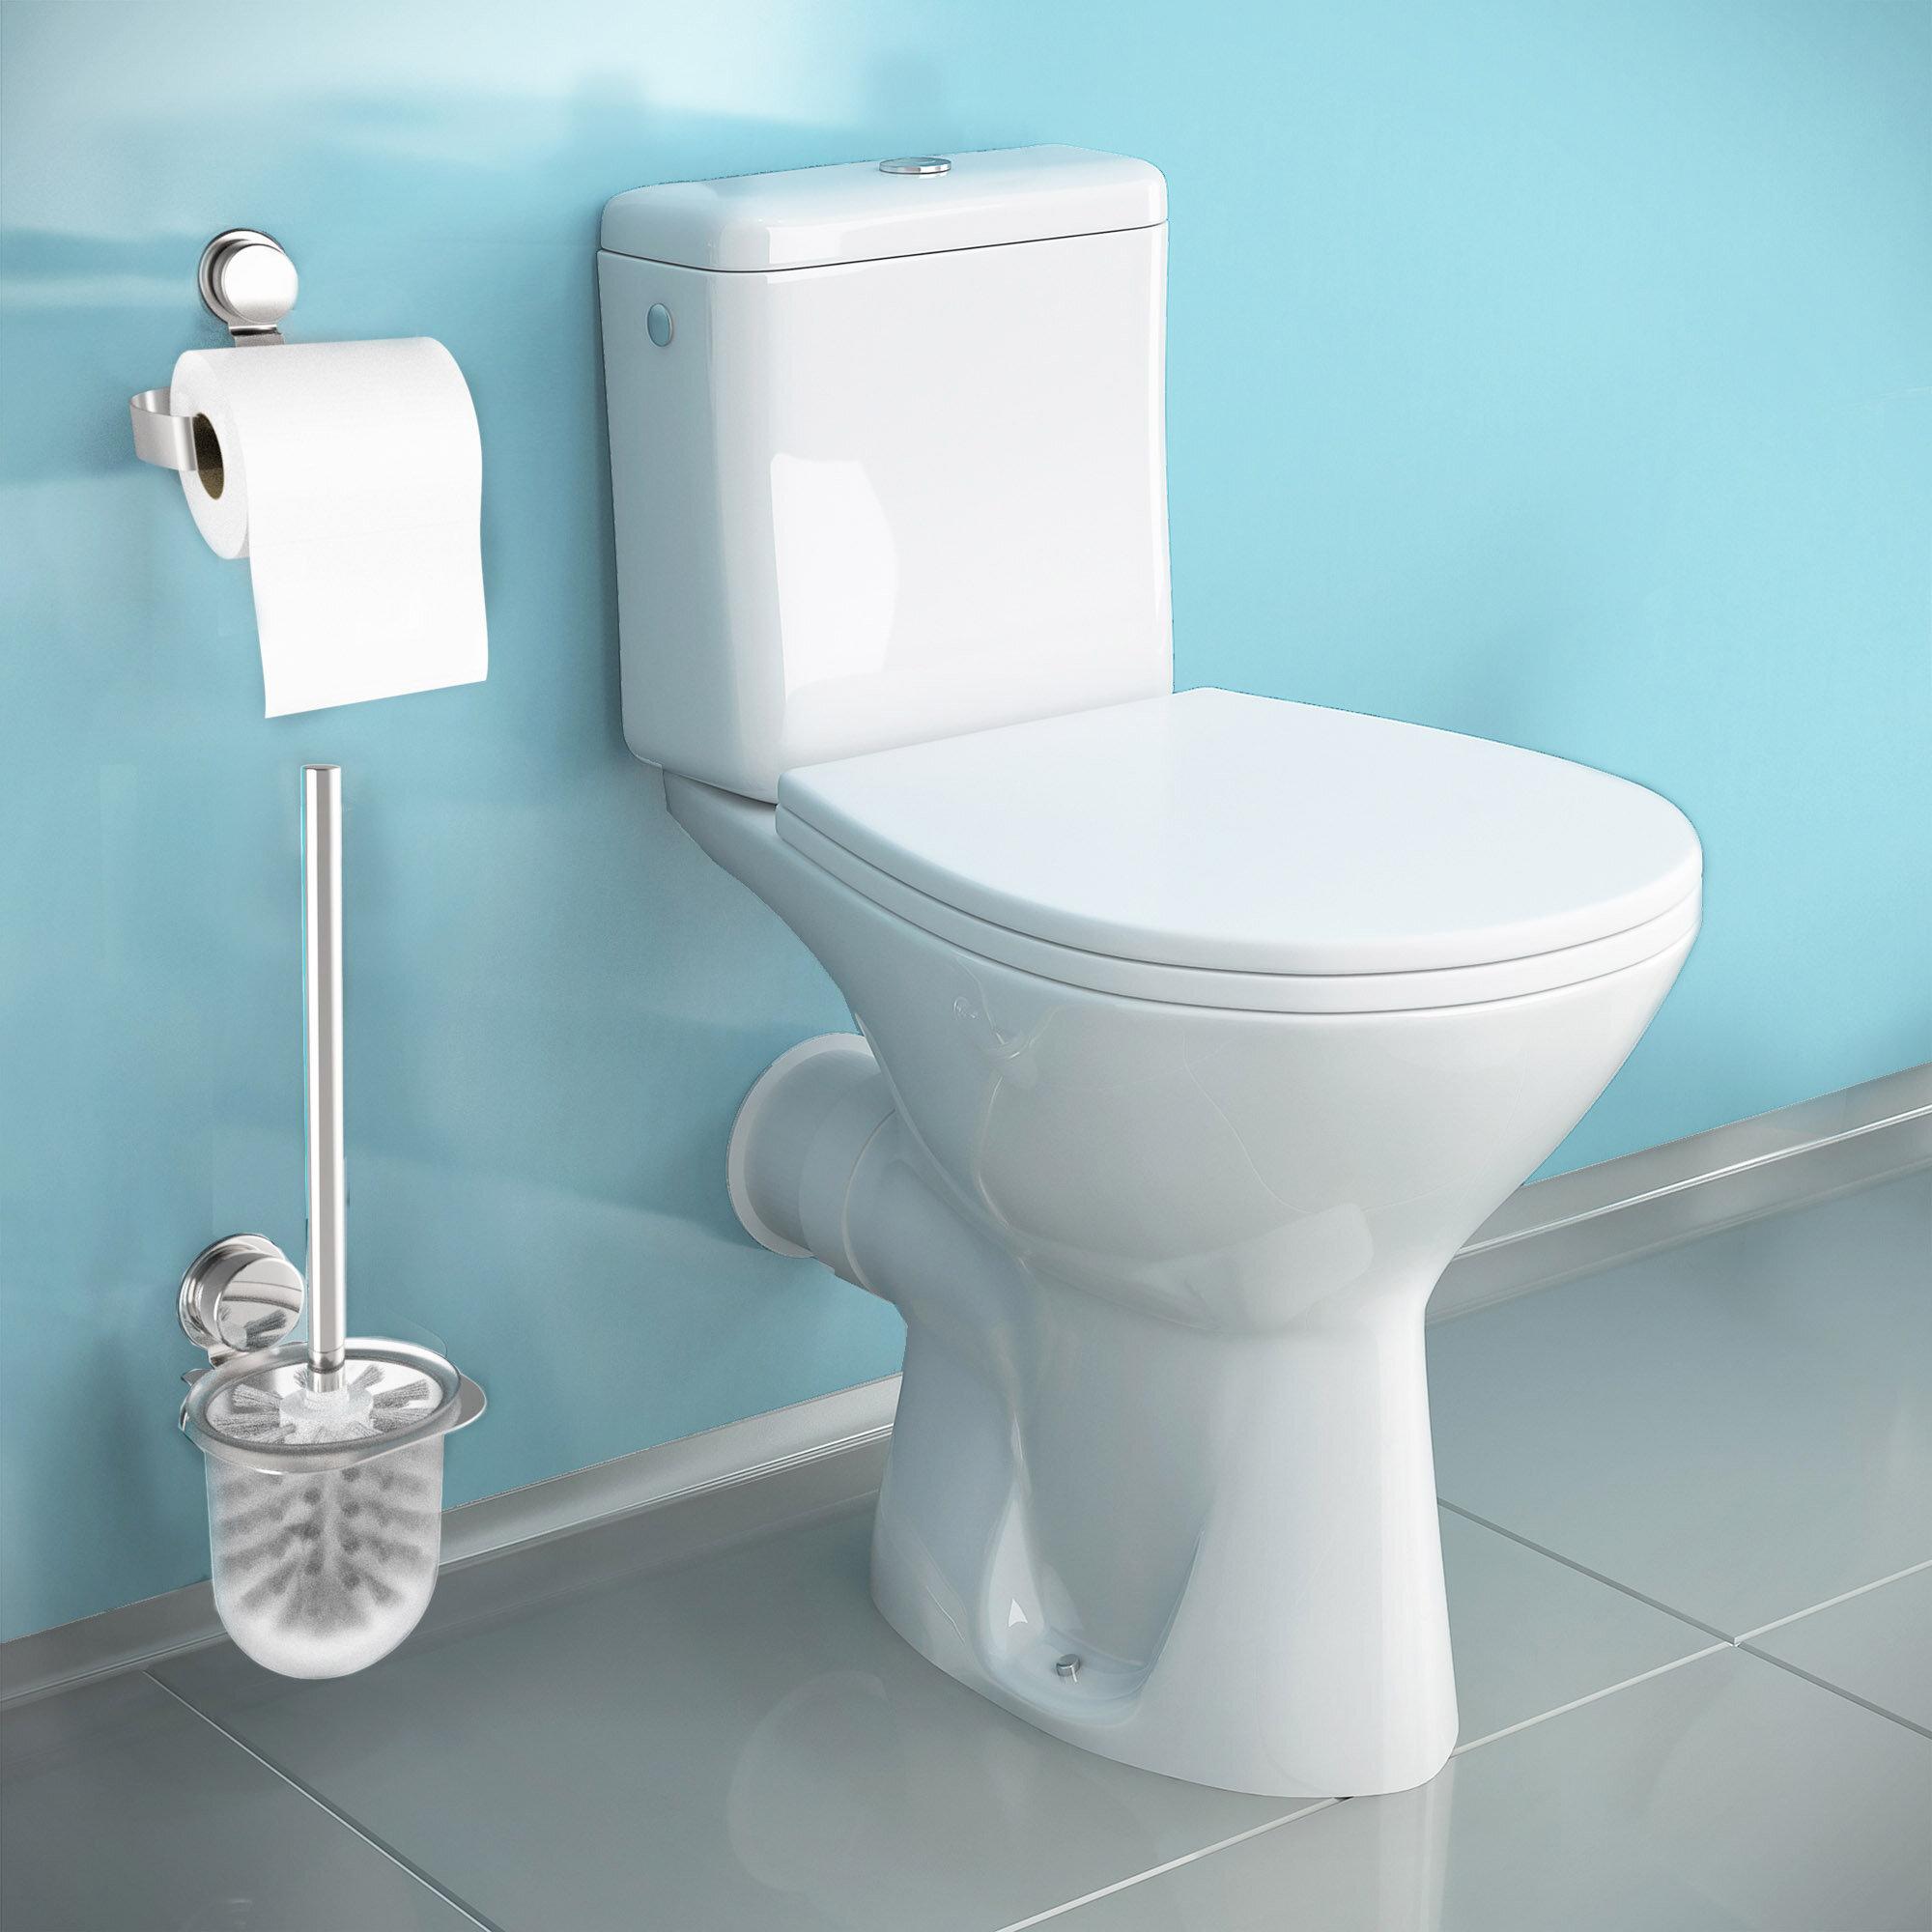 Bathroom Dixie Cup Dispenser   Wayfair